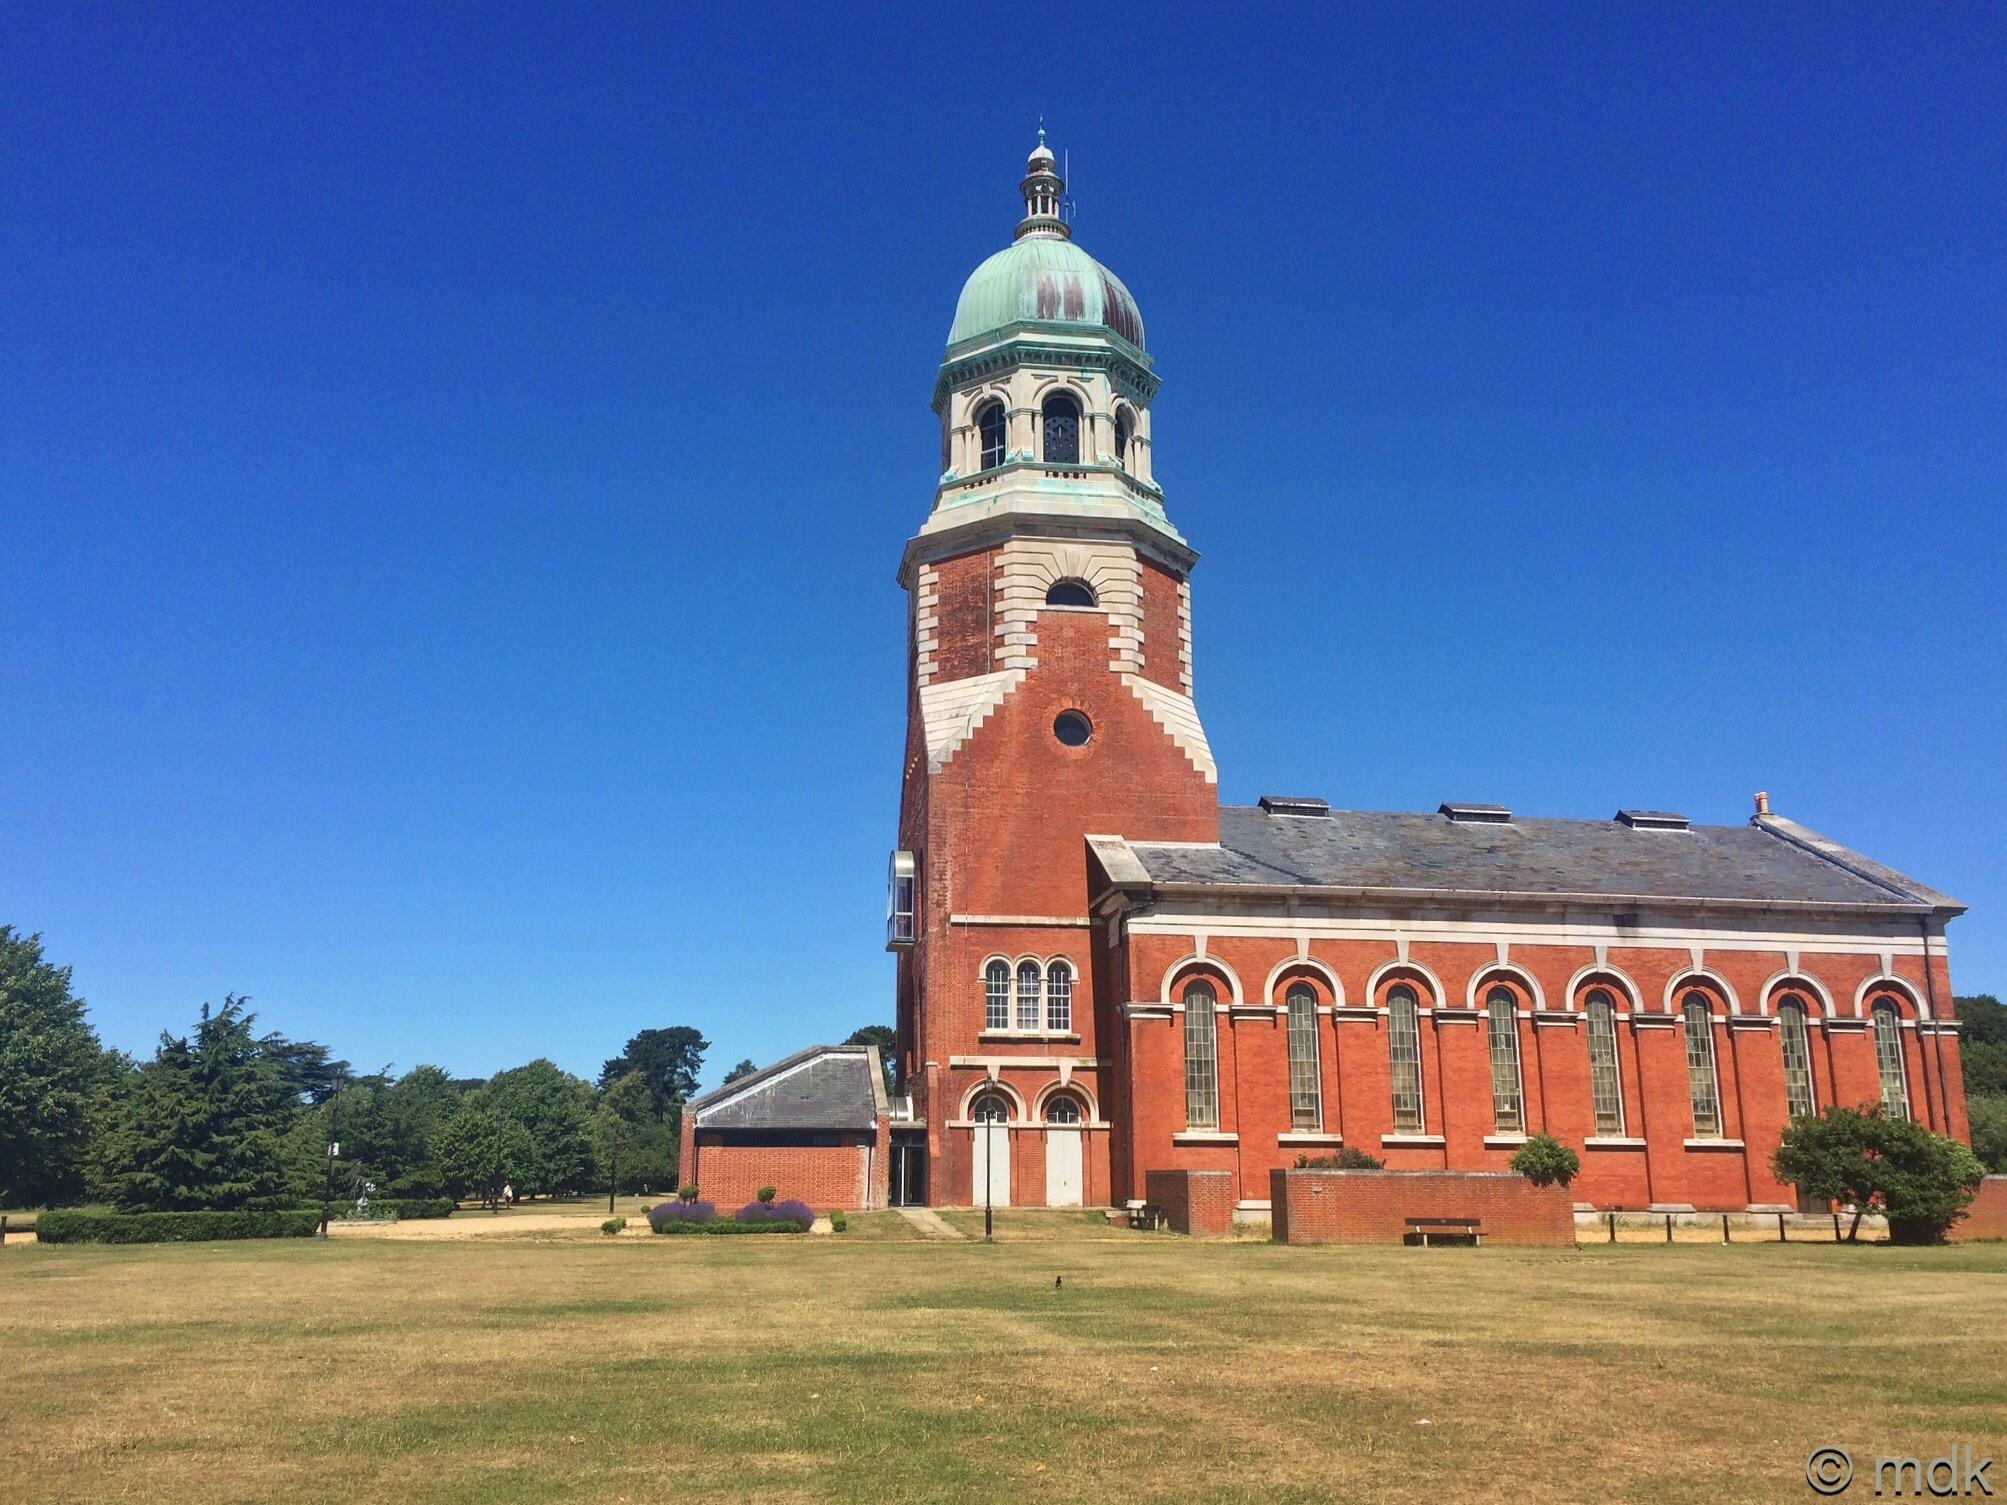 Royal Victoria Country Park Chapel